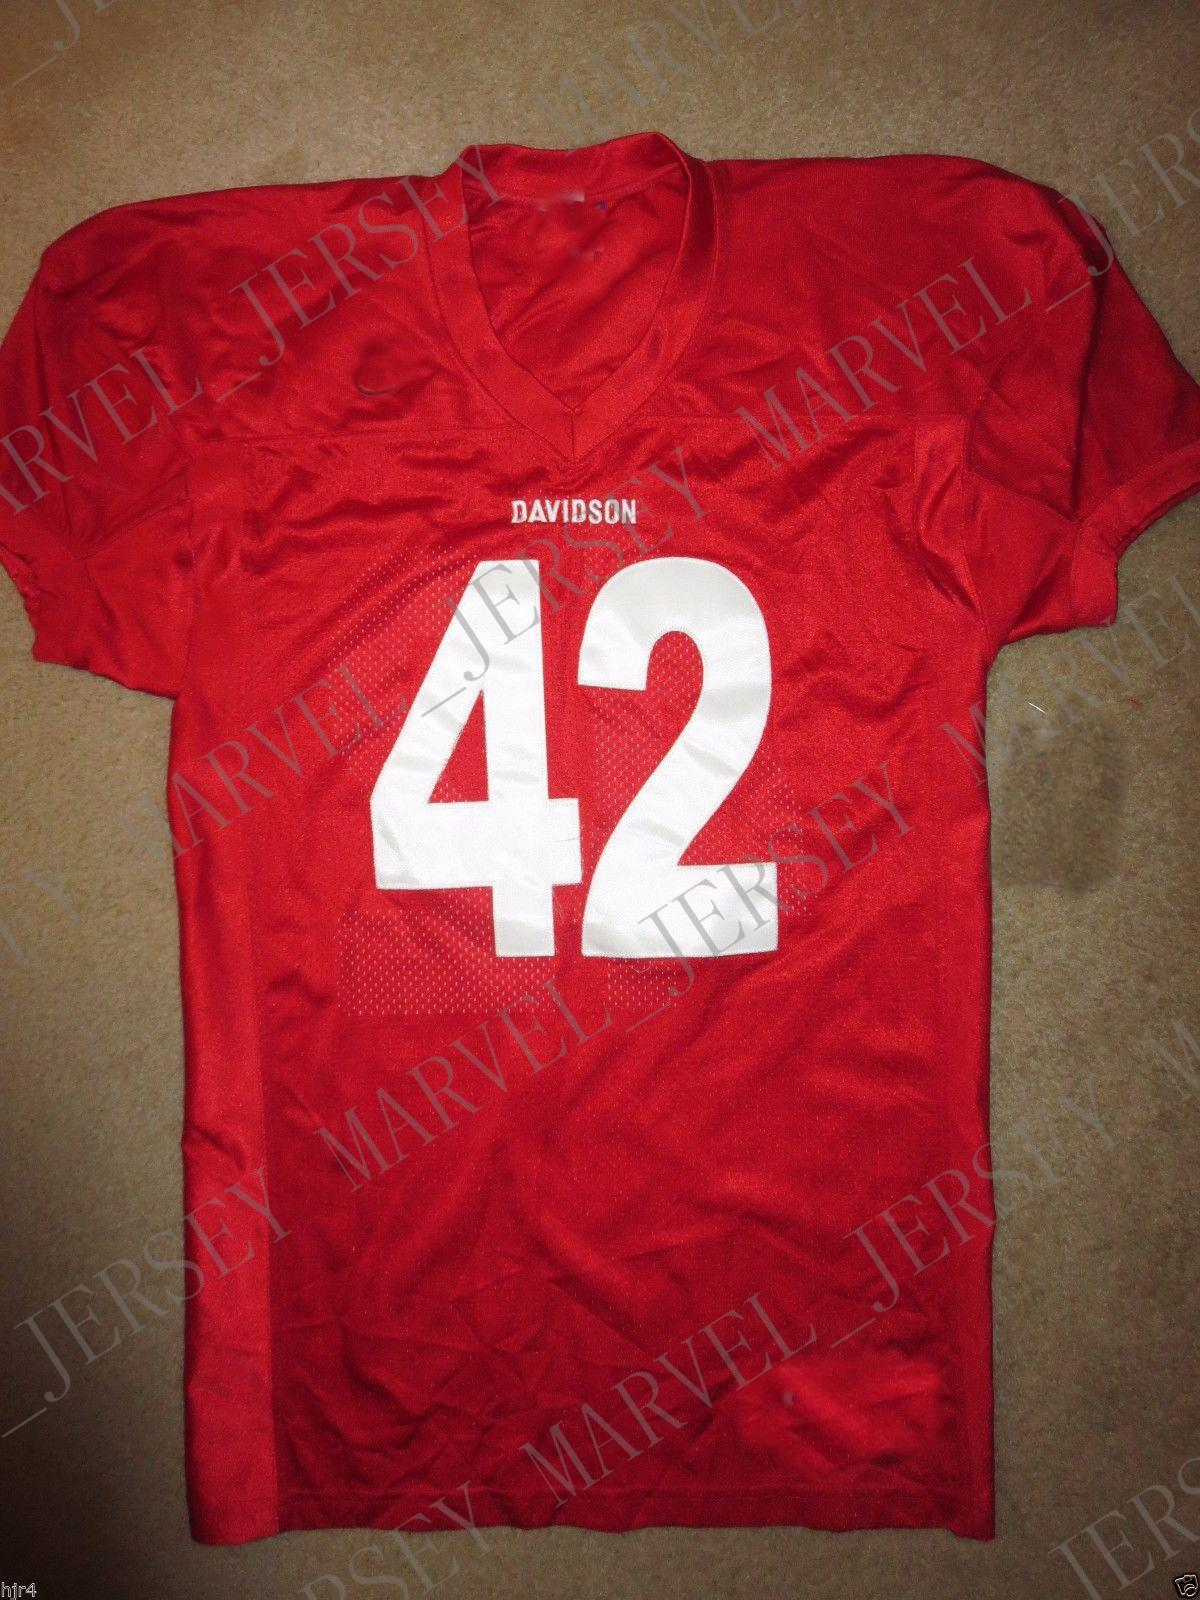 ceaab8897 Cheap Custom Davidson College Wildcats  42 NCAA Football Jerseys NEW Customized  Any Name Number Stitched Jersey XS-5XL Davidson College Wildcats Davidson  ...